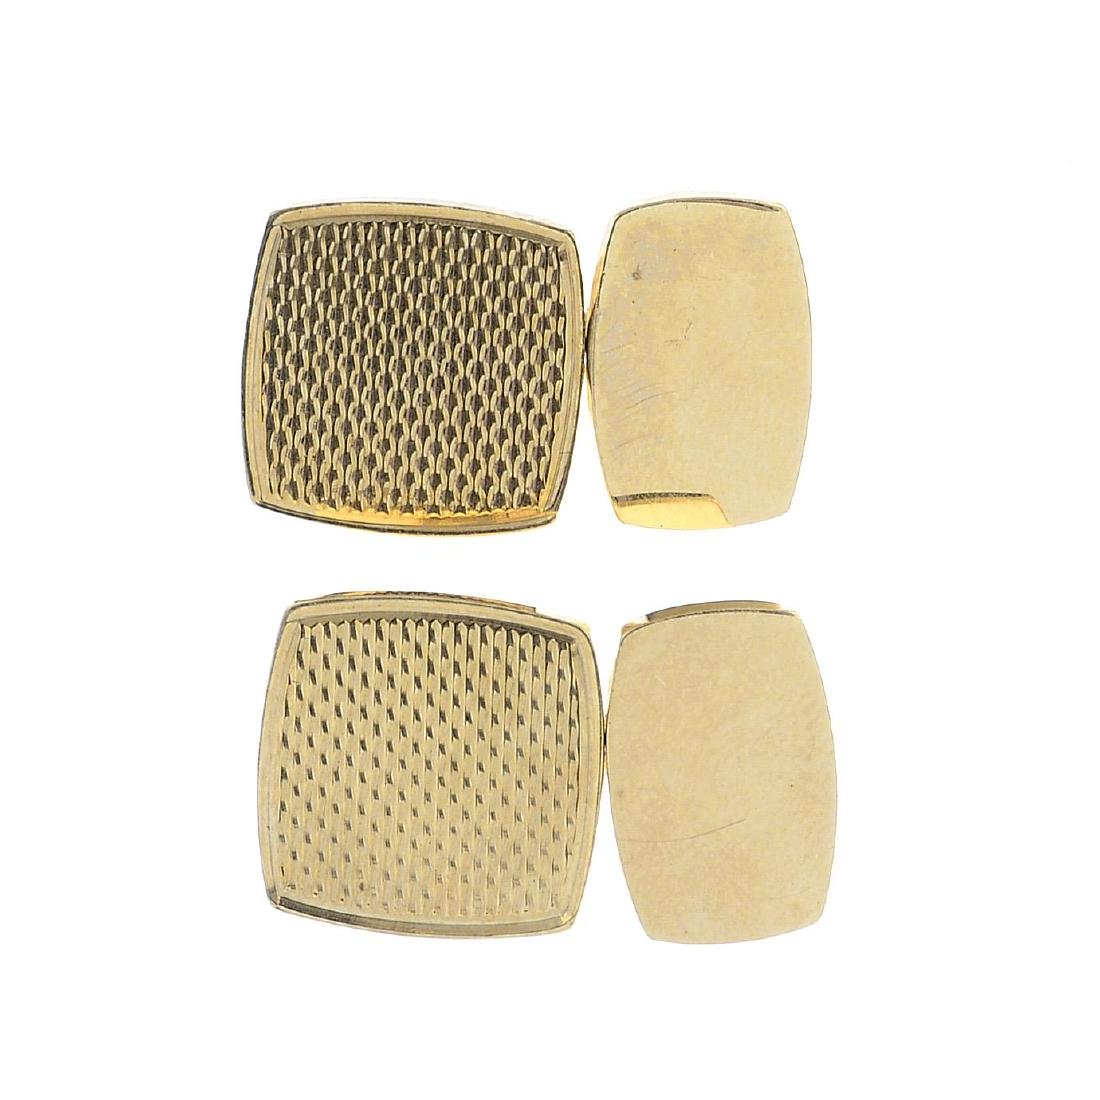 A pair of 9ct gold cufflinks. Each designed as a